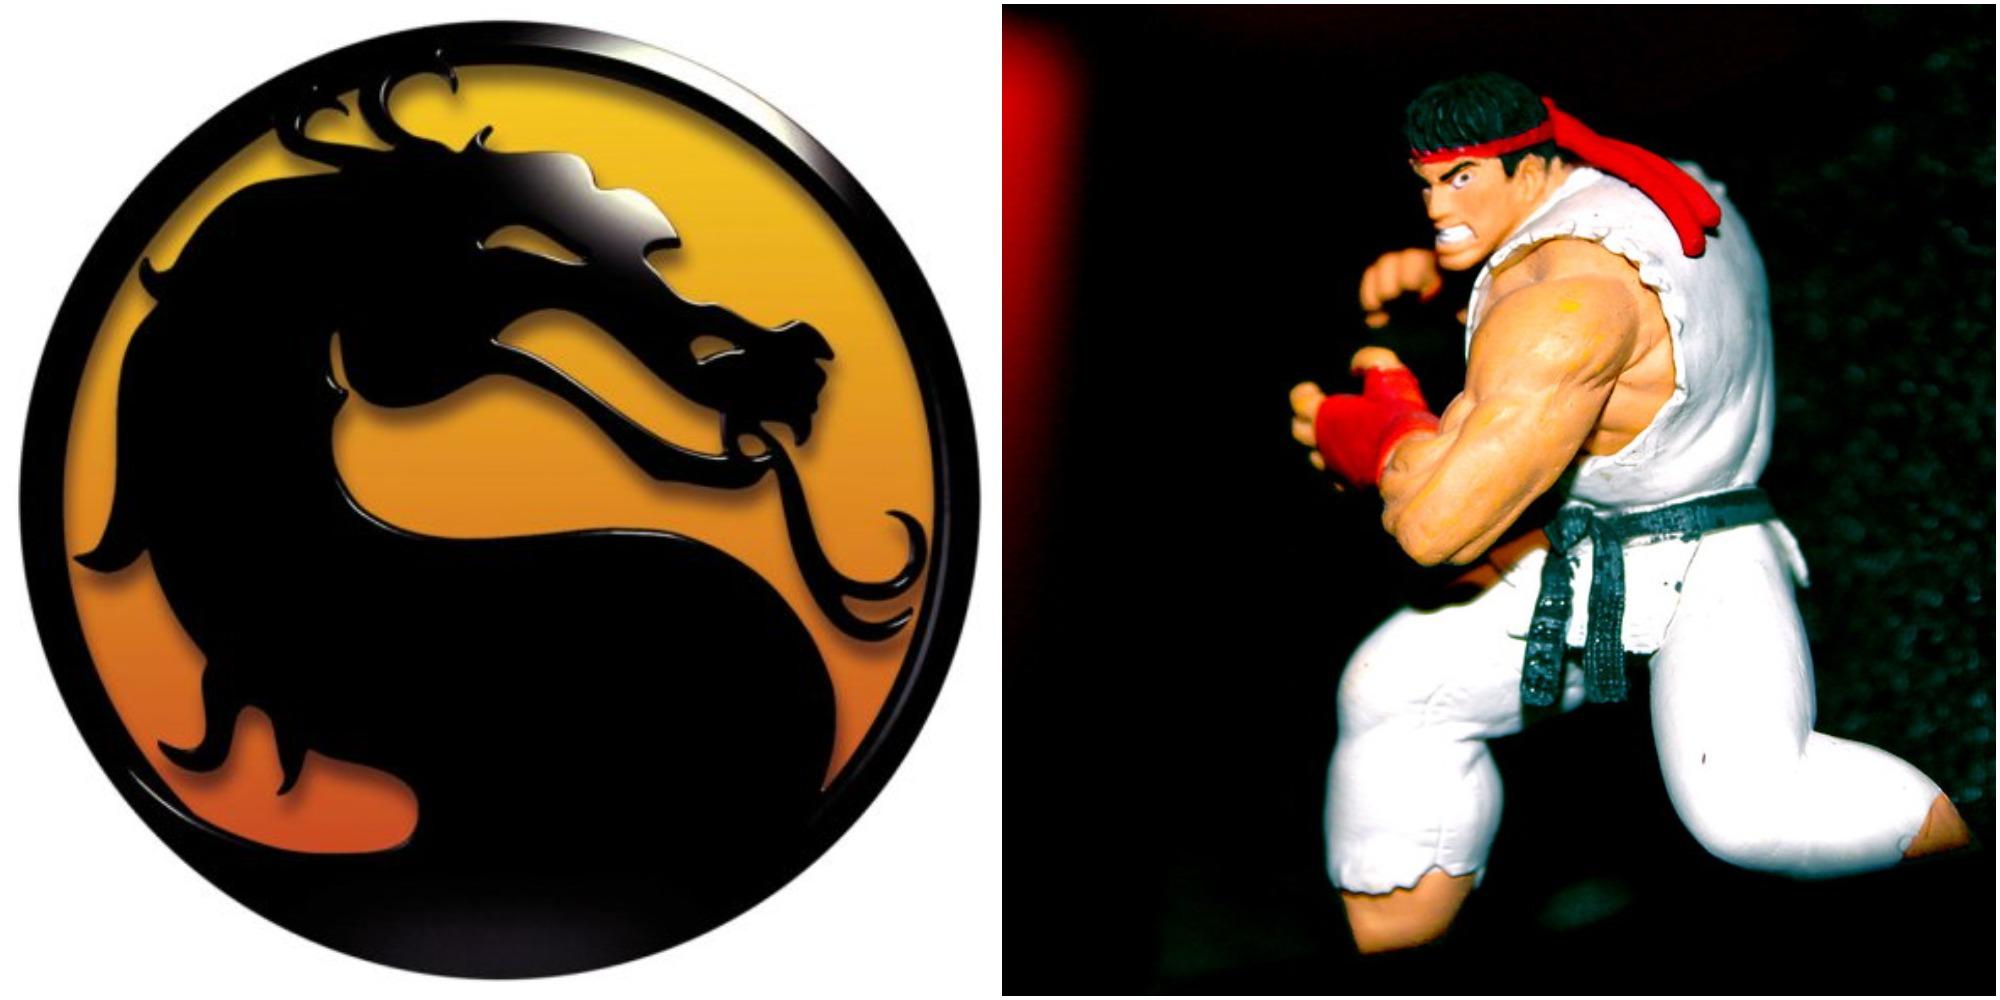 Street Fighter vs Mortal Kombat: która seria zasługuje na zwycięstwo?